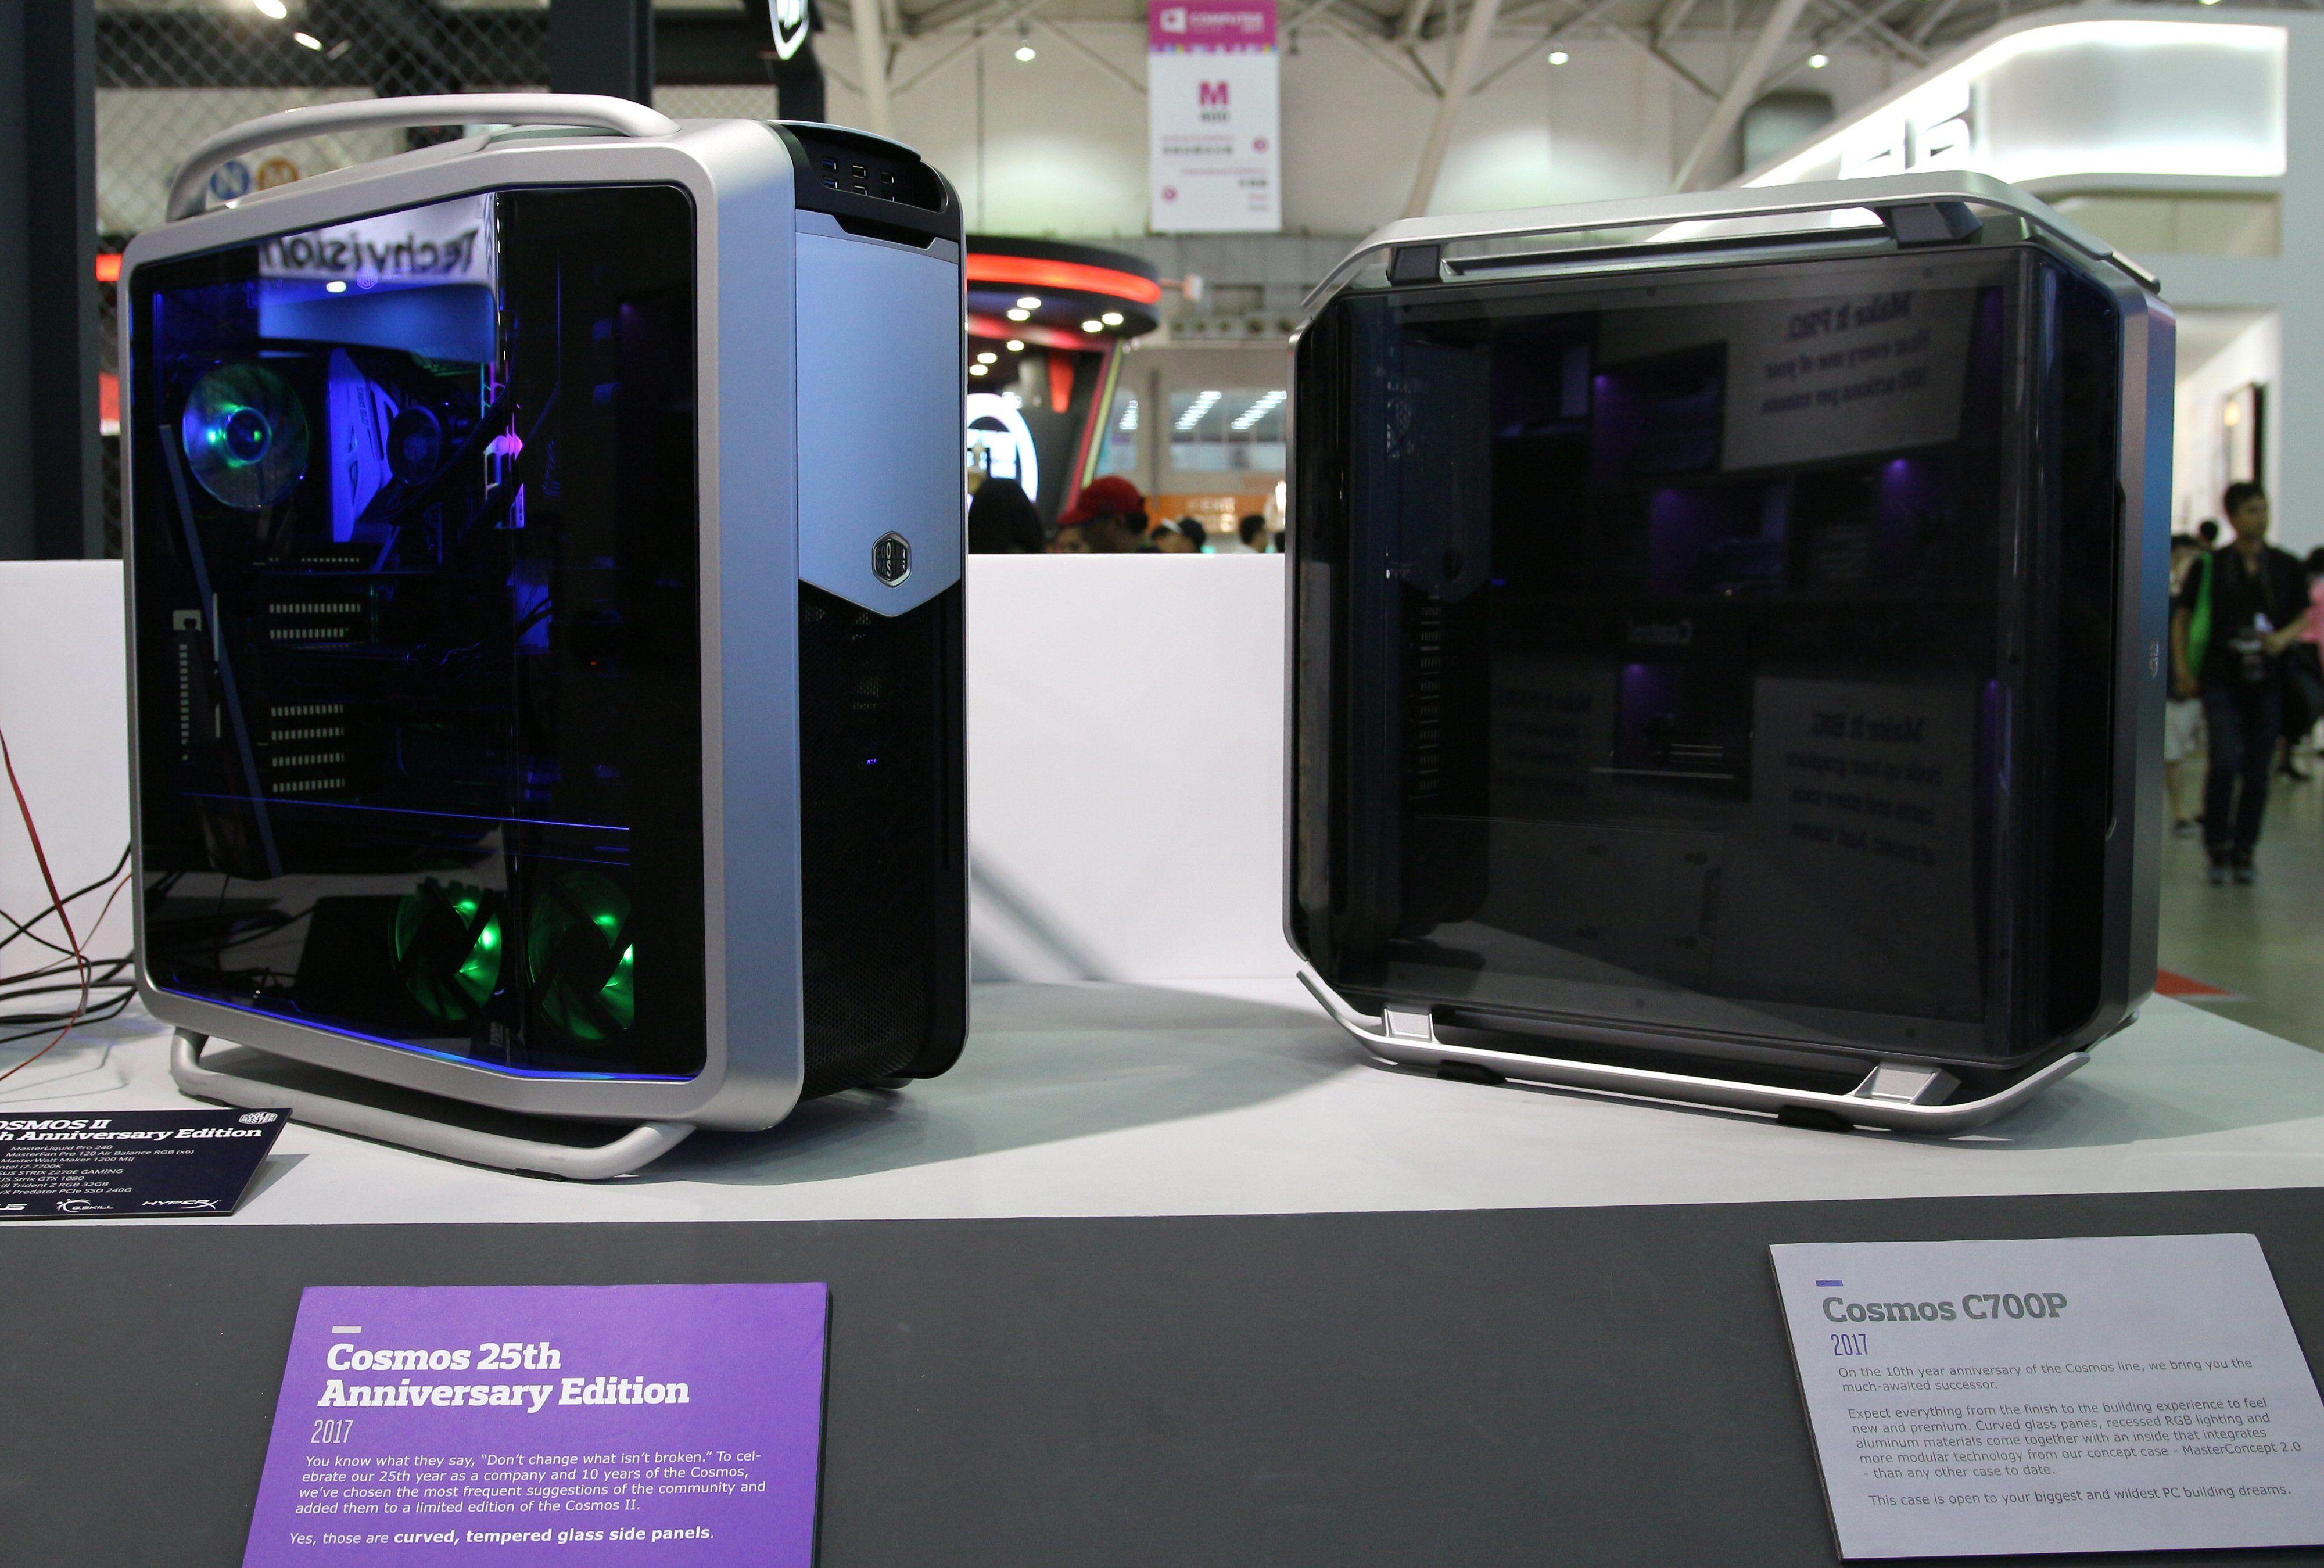 Cooler Master Cosmos 25th Anniversary Edition til høyre, Cosmos C700P til venstre.